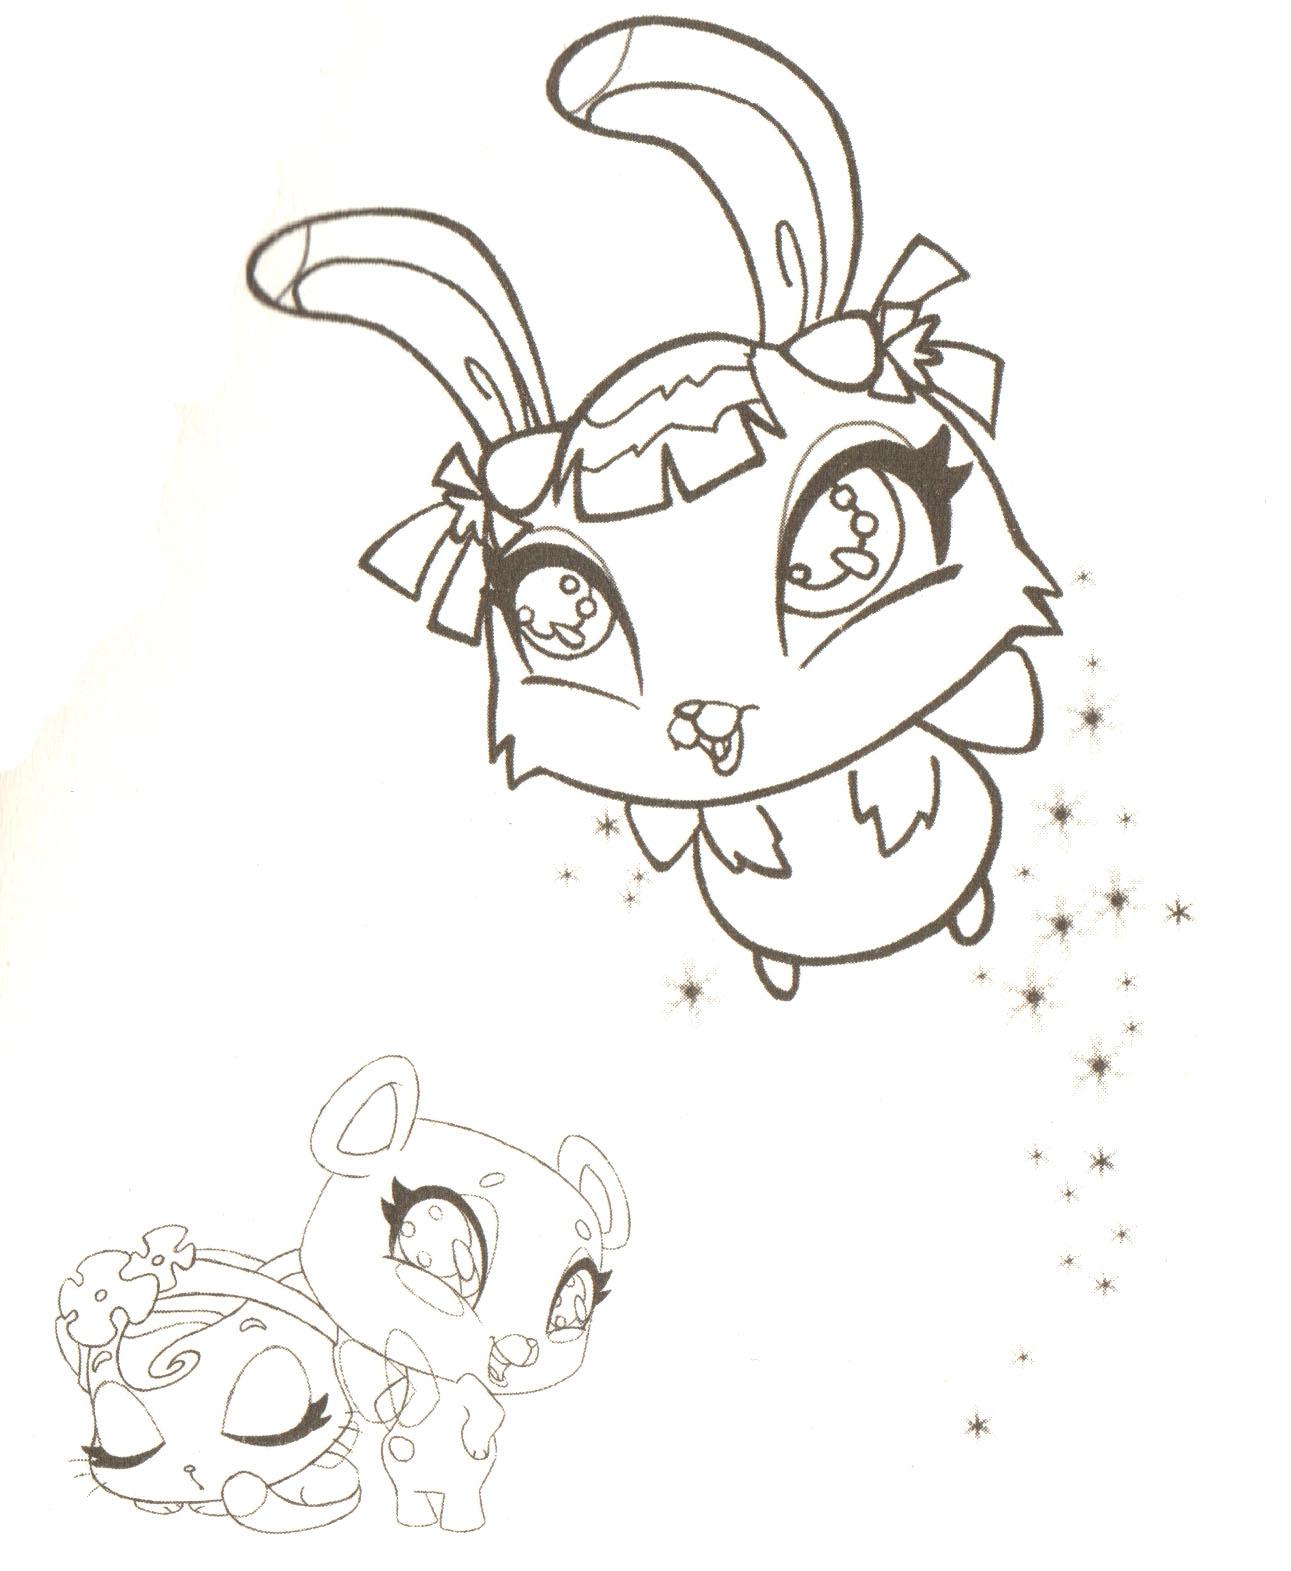 winx club pets coloring pages - winx club all colorear mascotas